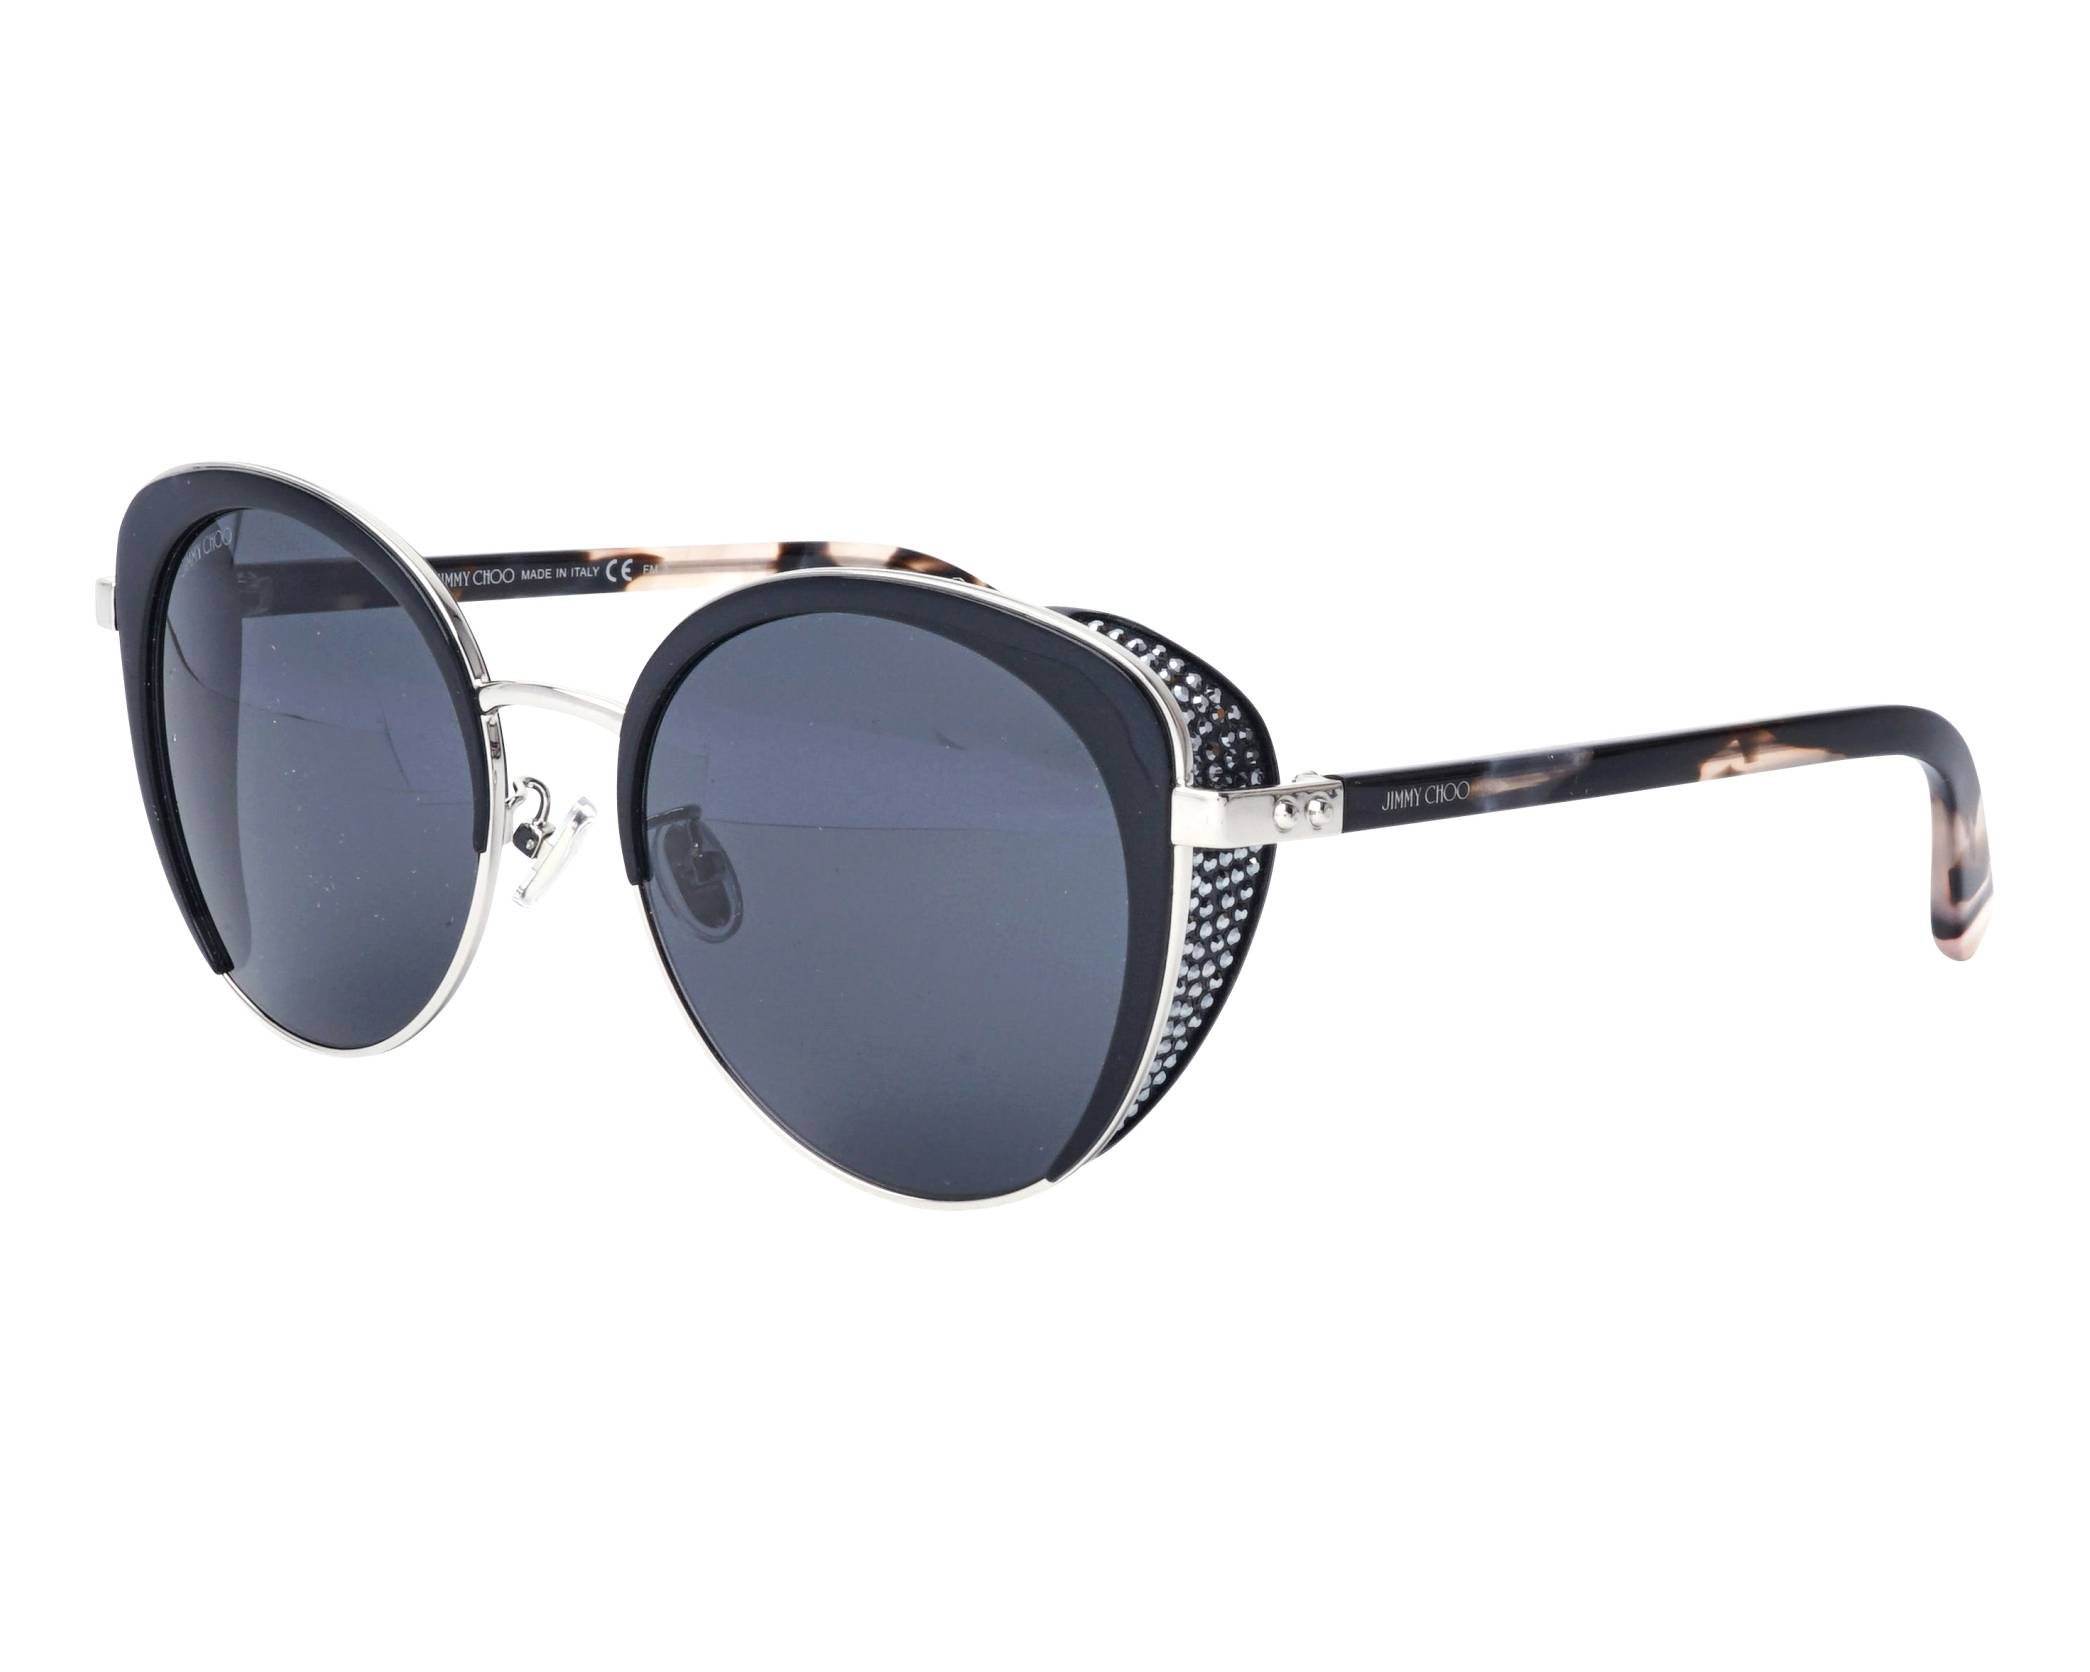 Jimmy Choo Cora/S Sunglasses - Jimmy Choo Authorized